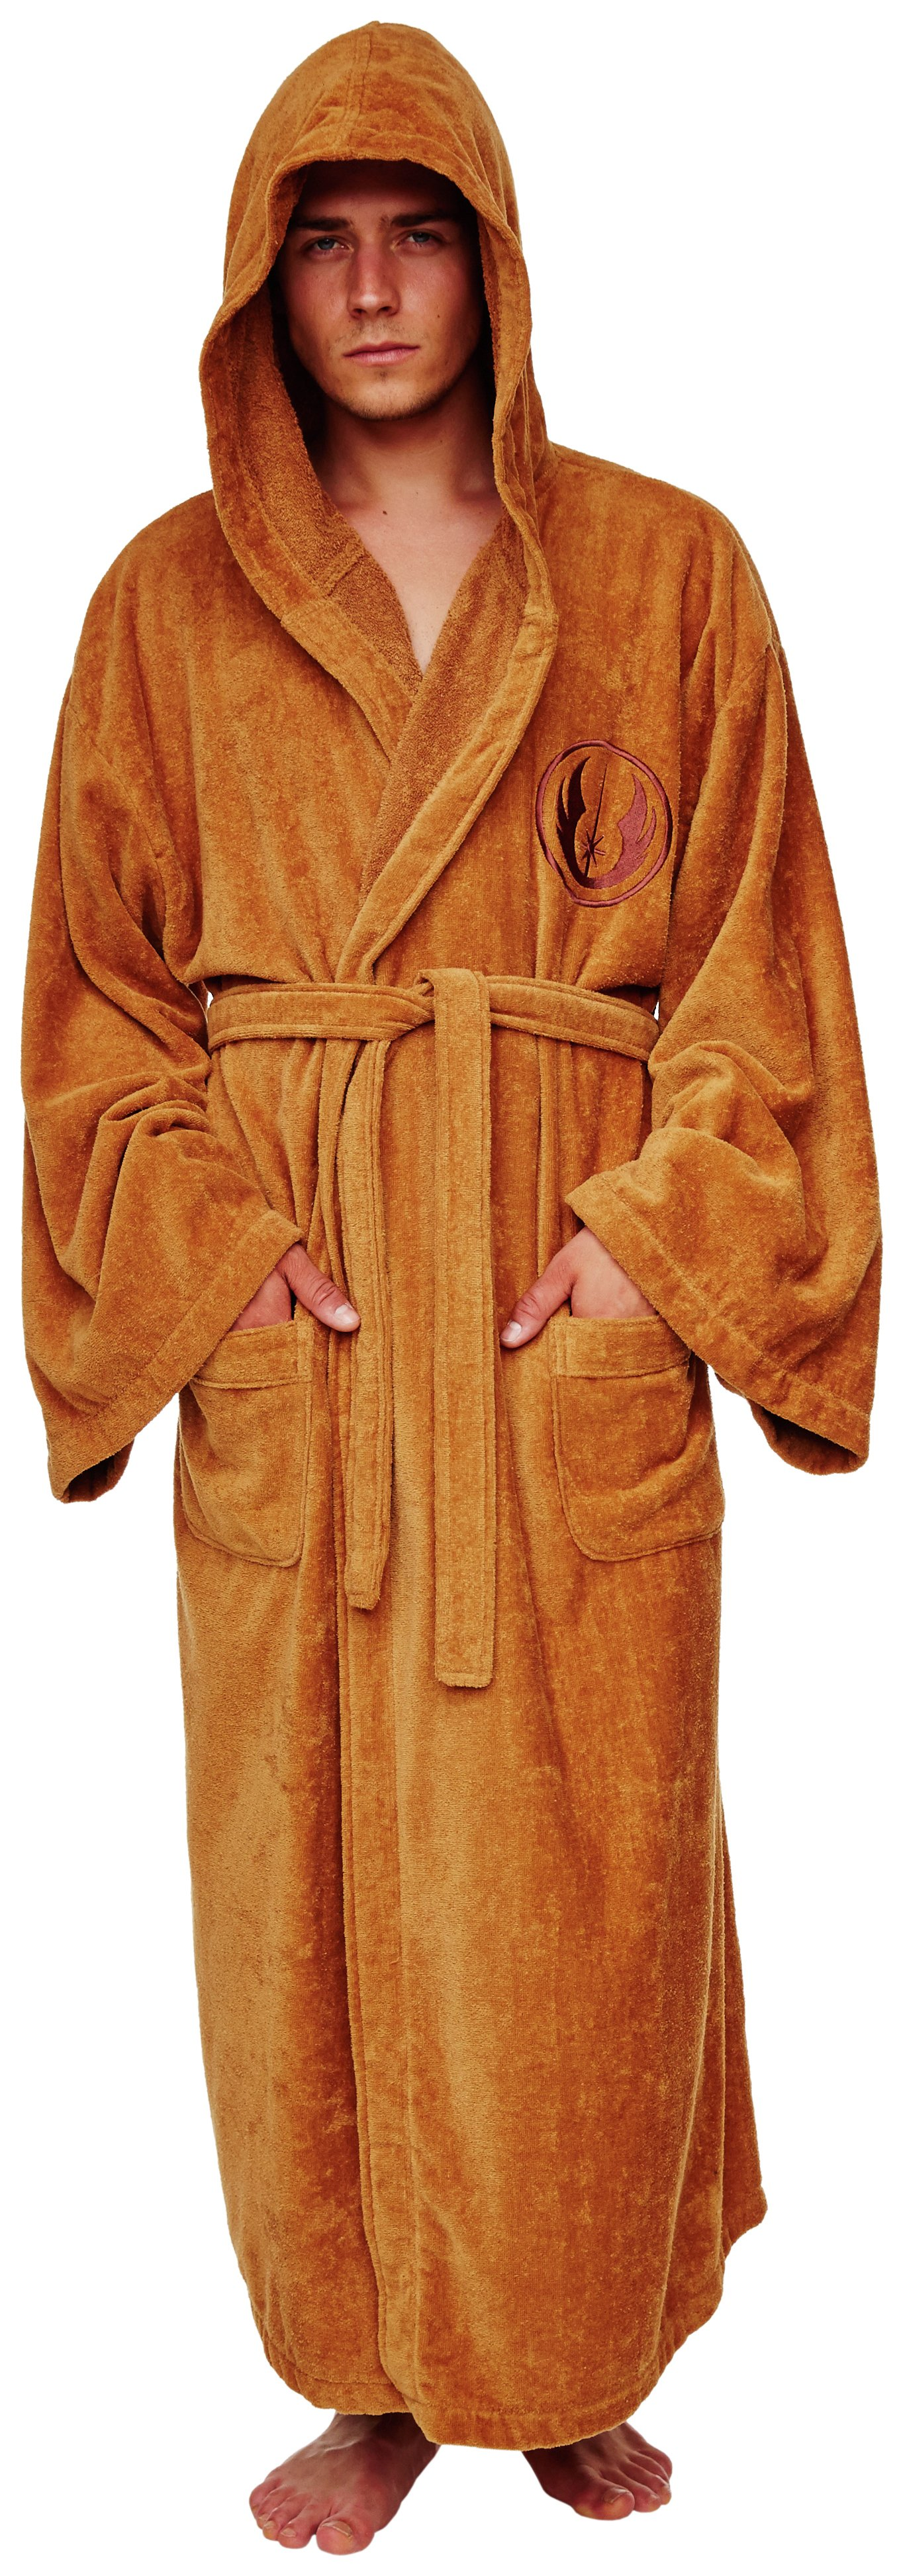 Image of Star Wars Jedi Robe